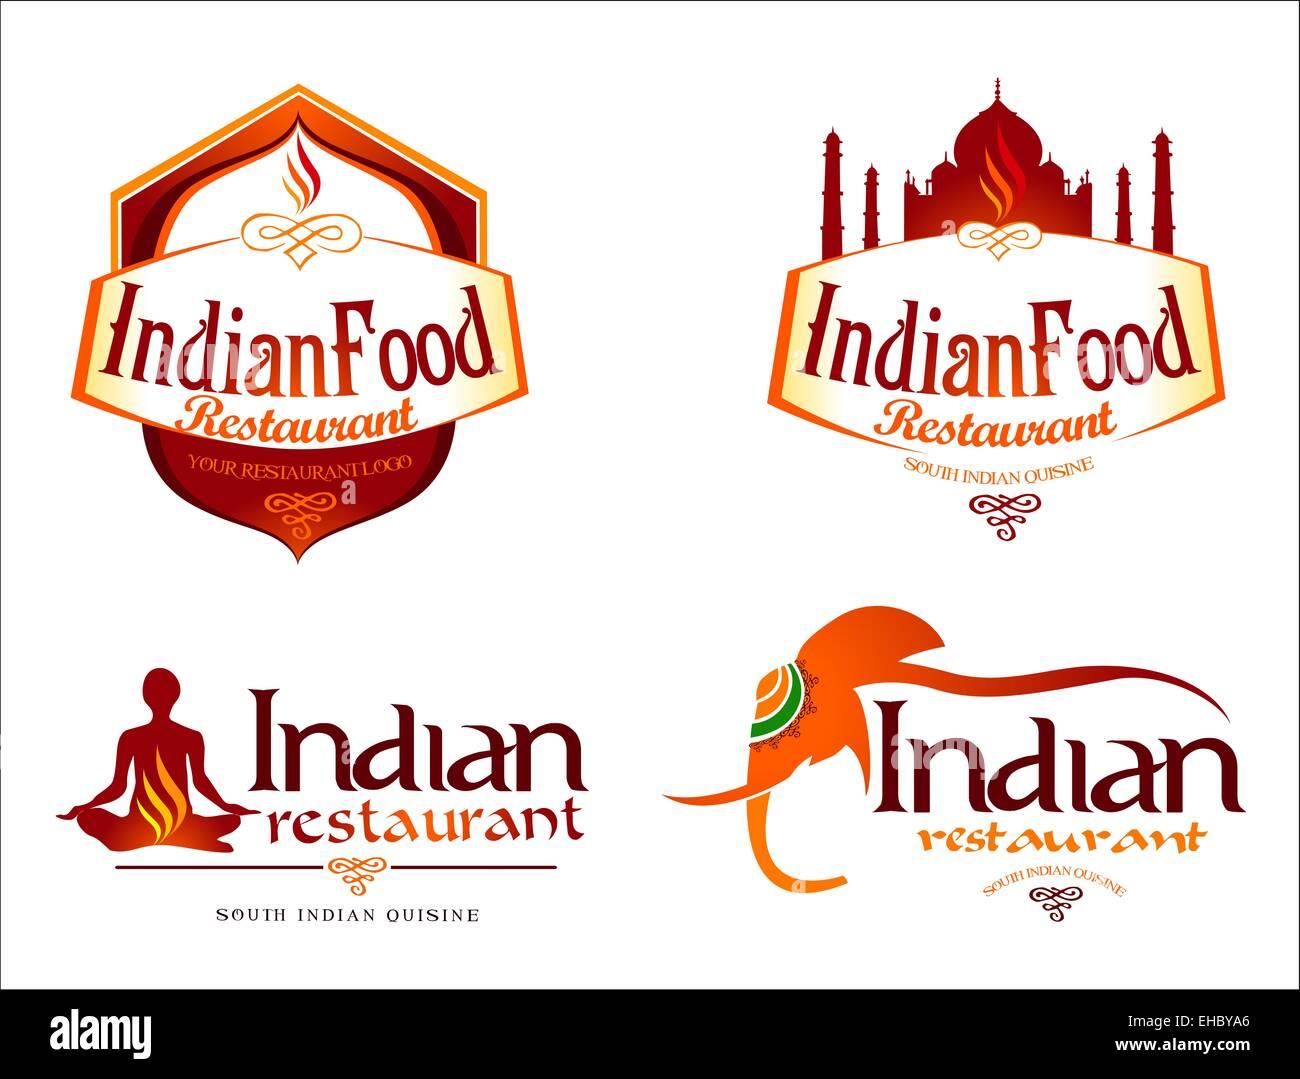 Indian Food Logo Creative Restaurant Logo Vector Template Indian Stock Photo Alamy